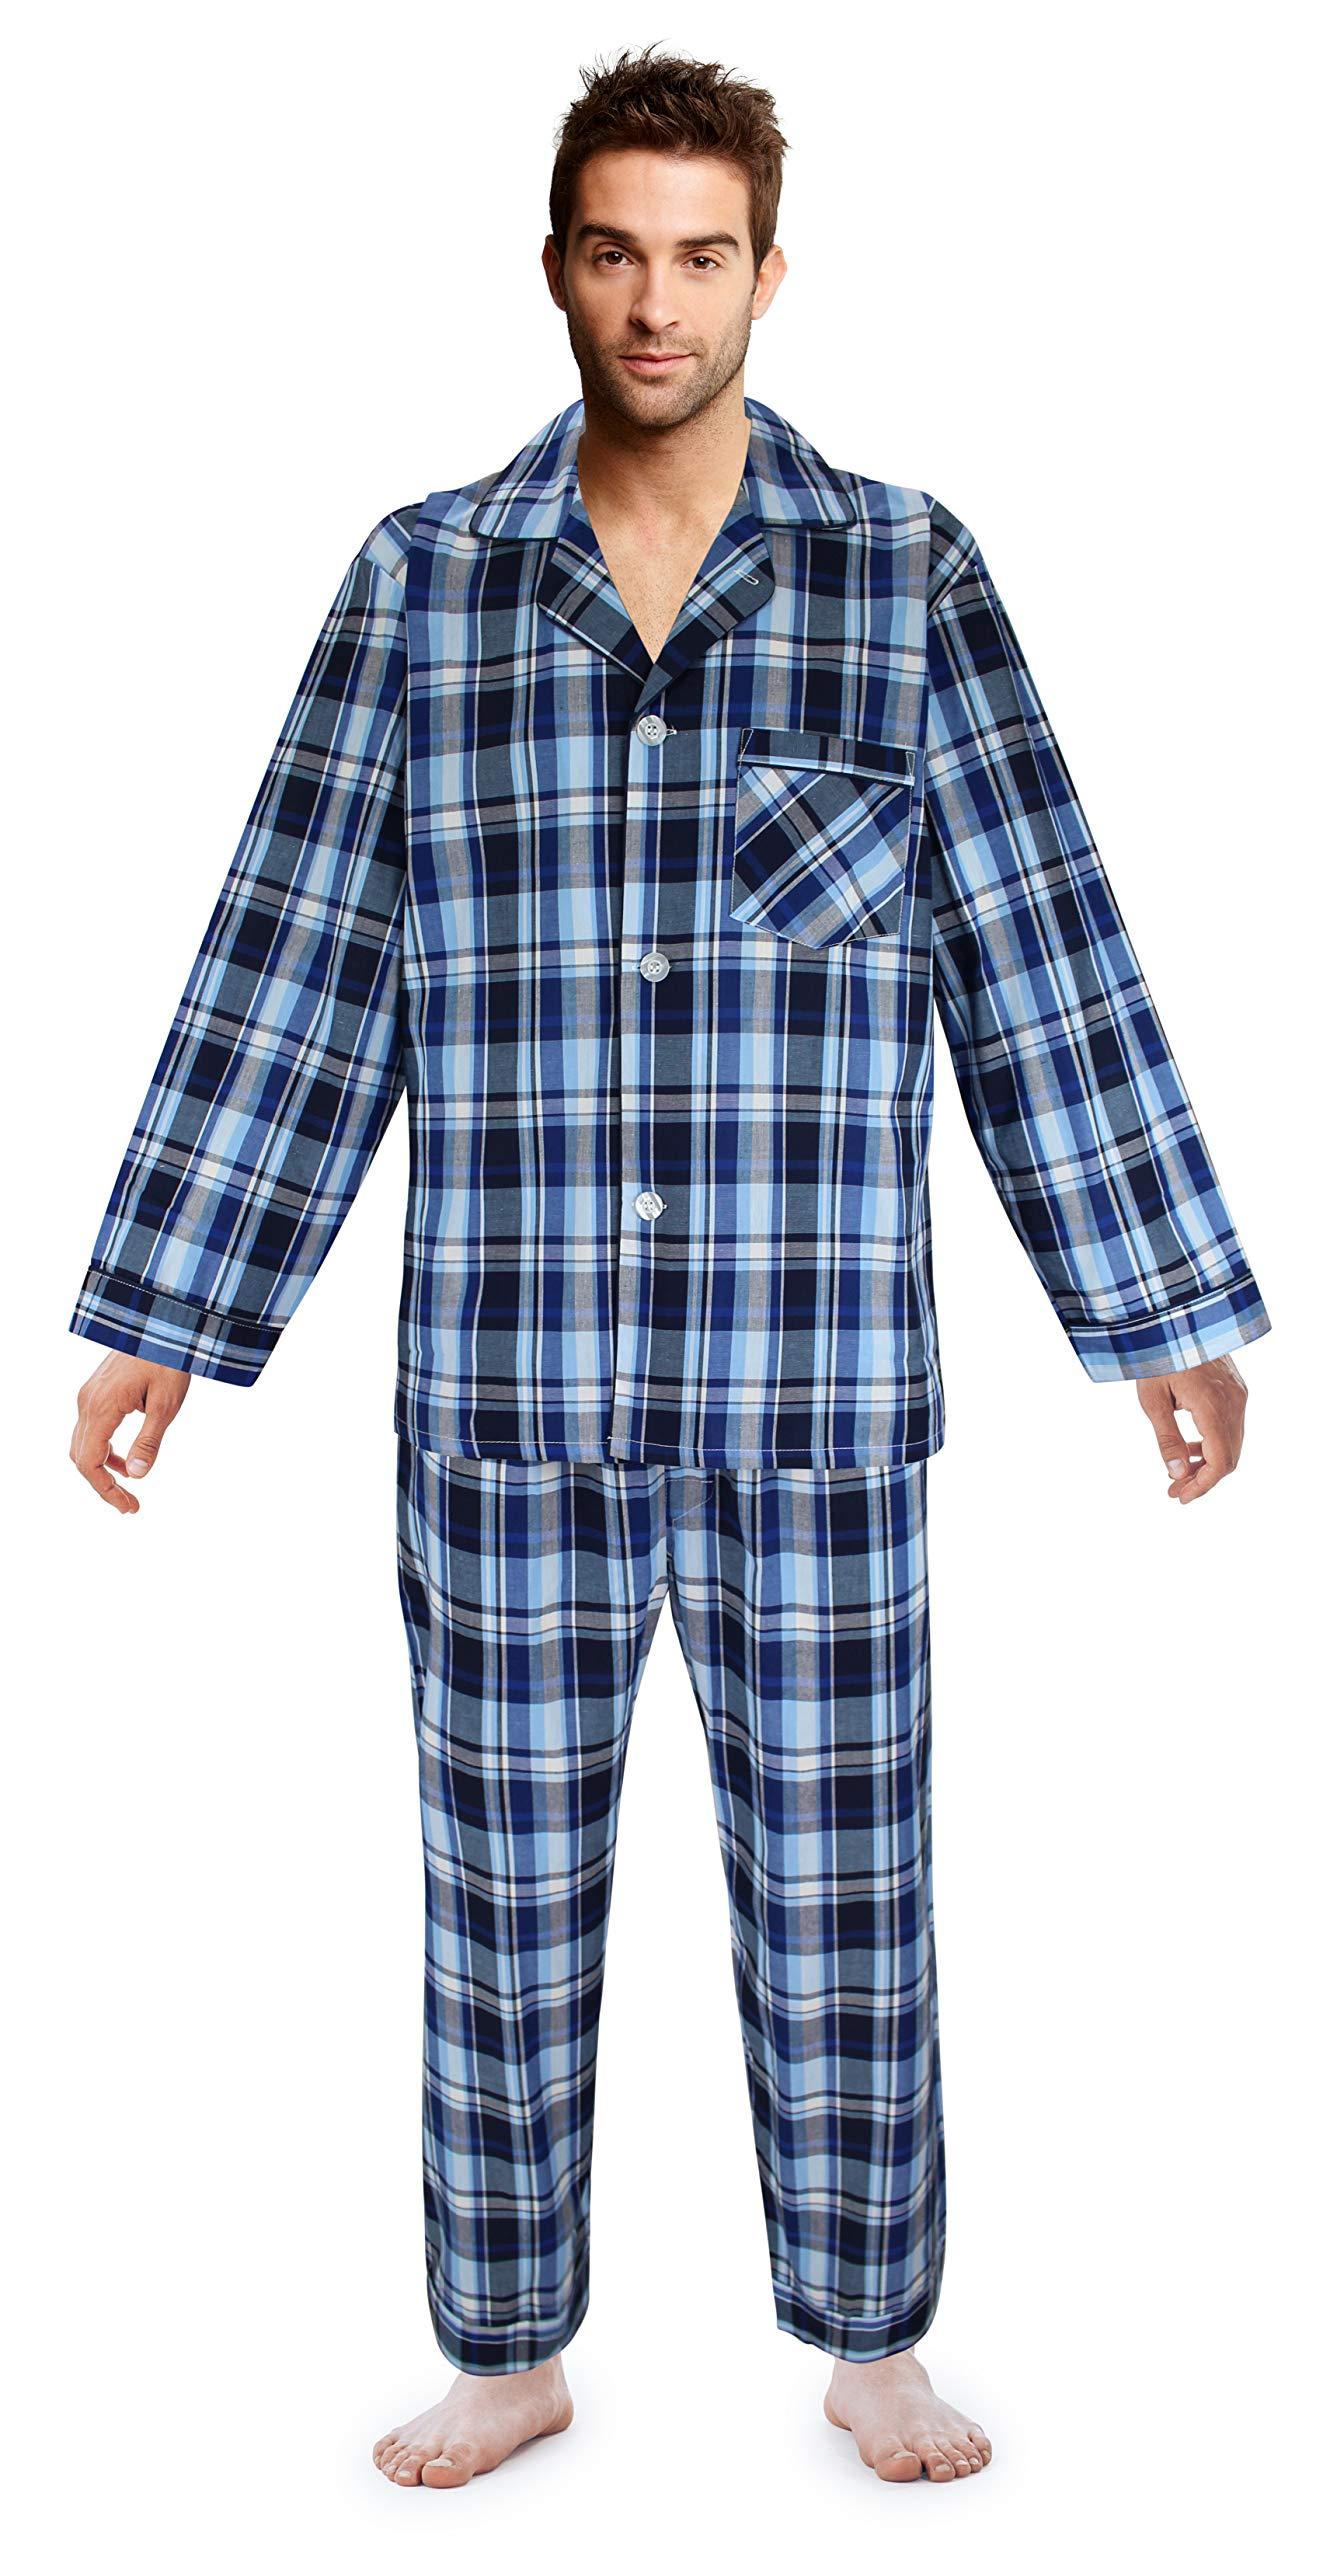 Casual Trends Men's Pajama Set Broadcloth Pajamas for Men, Large